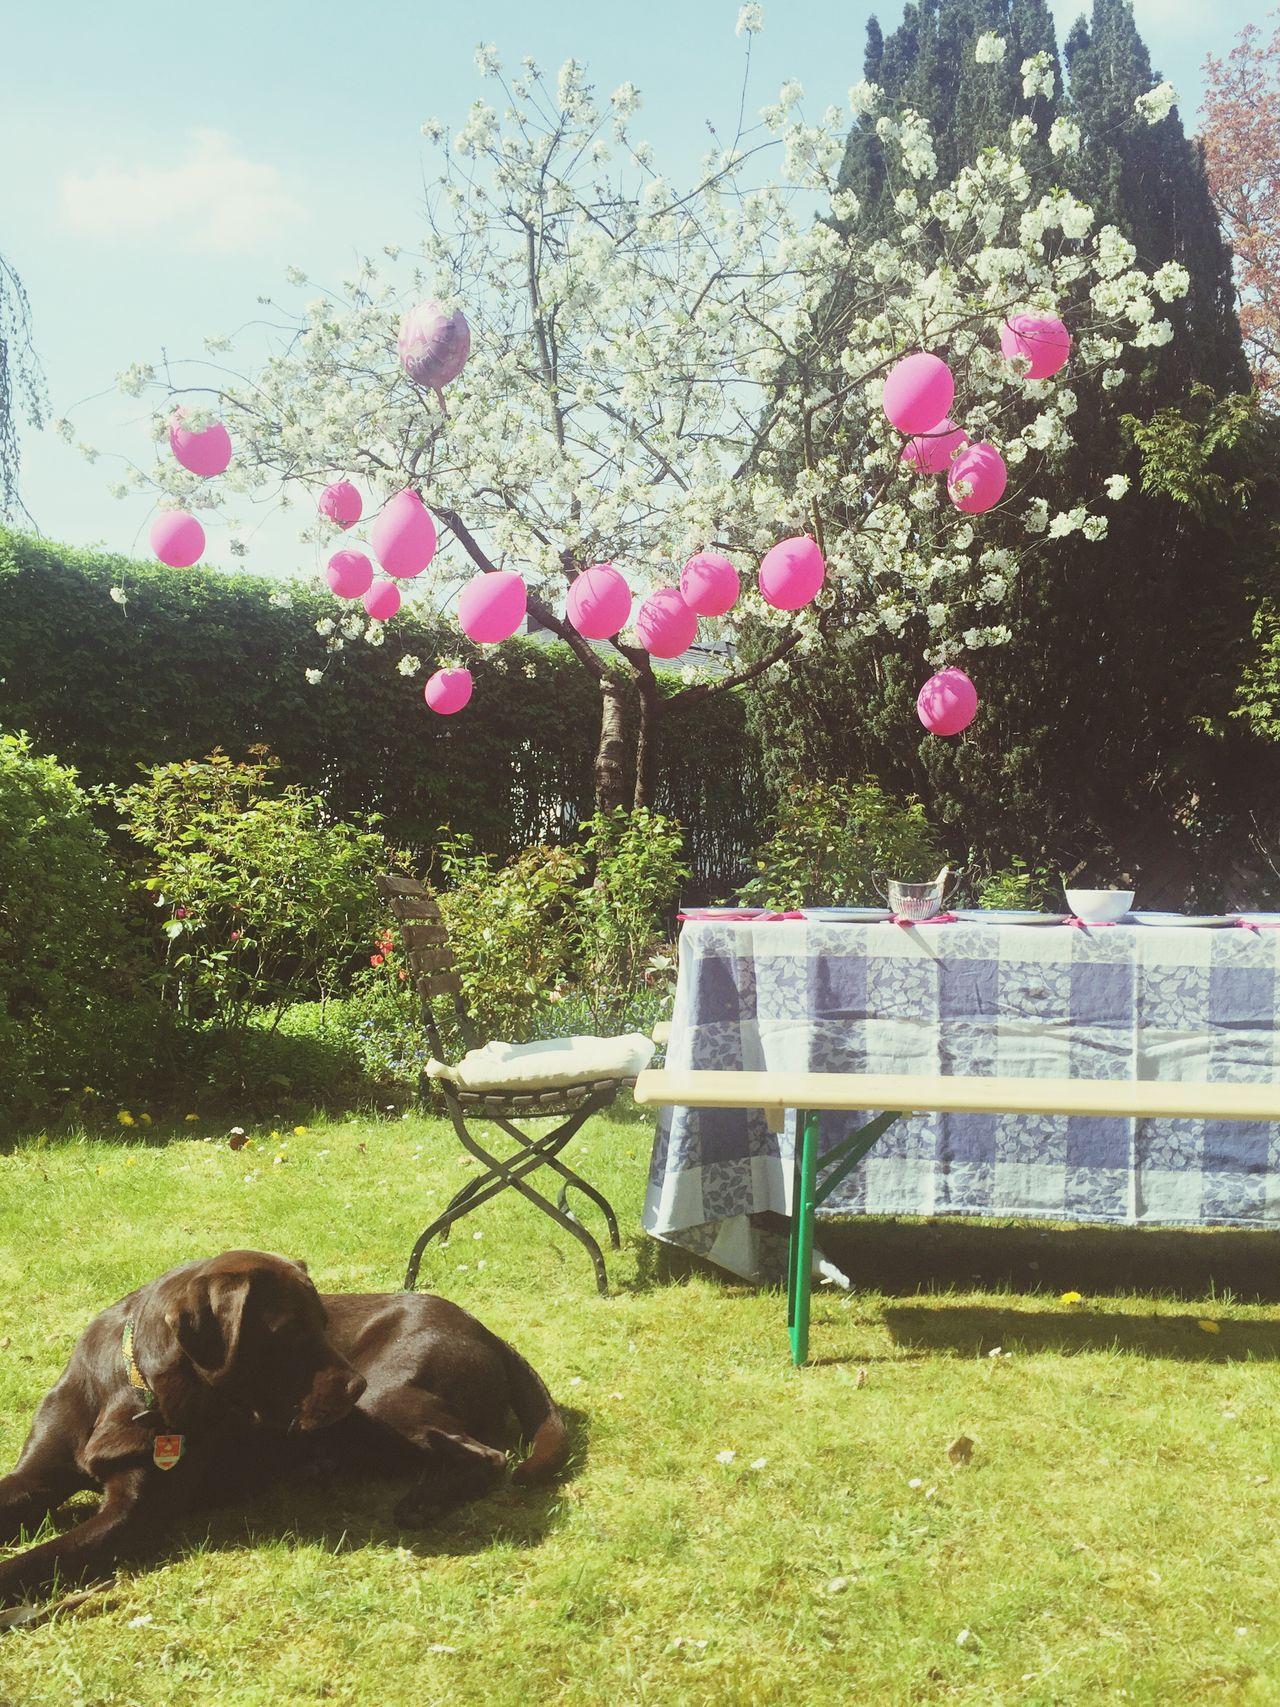 Gardenparty Beerbench Balloons Babyshower Trees Coffeetable Dog Labrador Summer